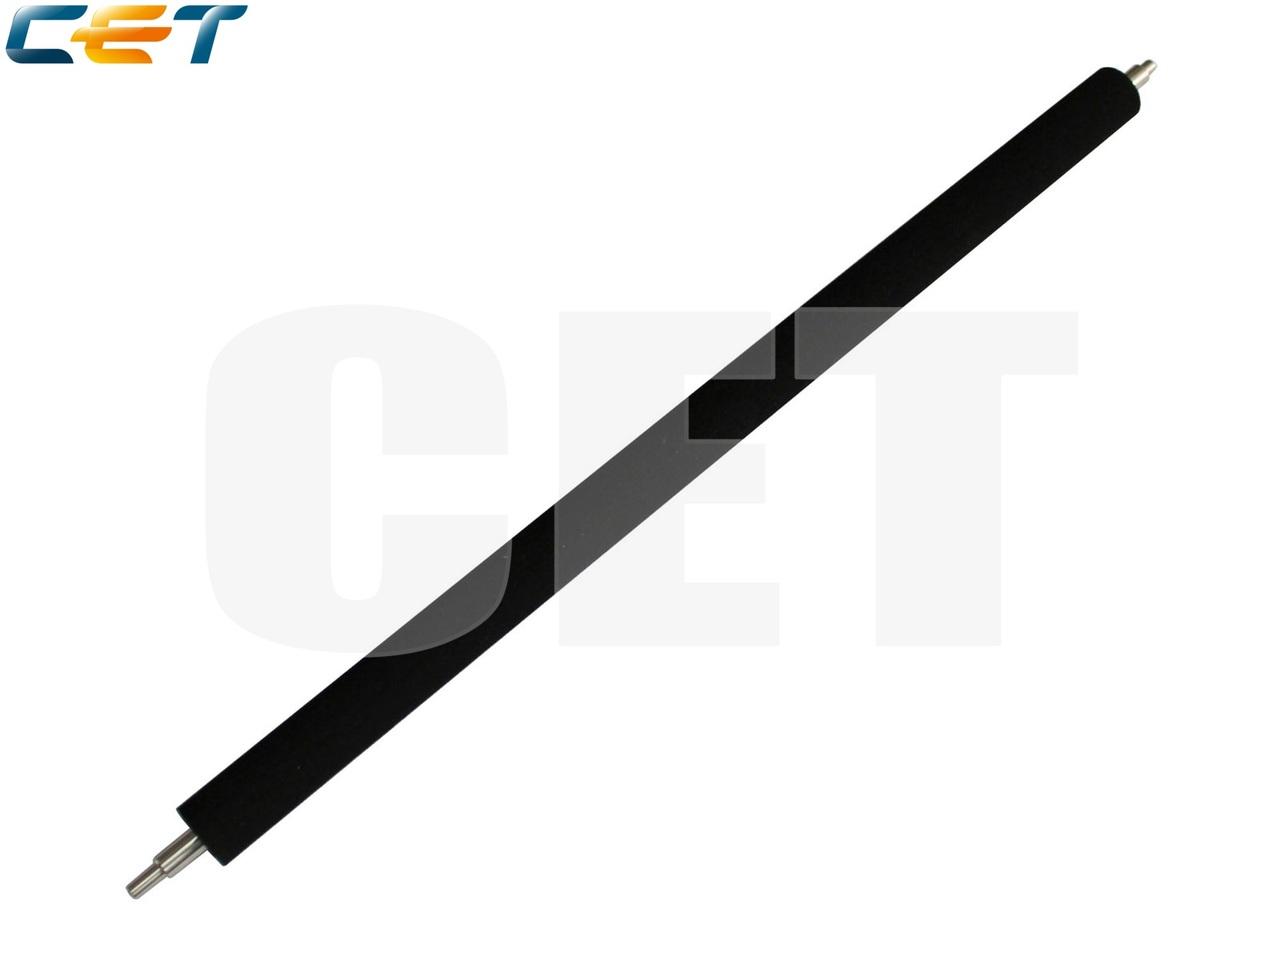 Ролик переноса FC9-0693-000 для CANON iR ADVANCE4025/4035/4045/4051/4225/4235/4245/4251 (CET), CET6584